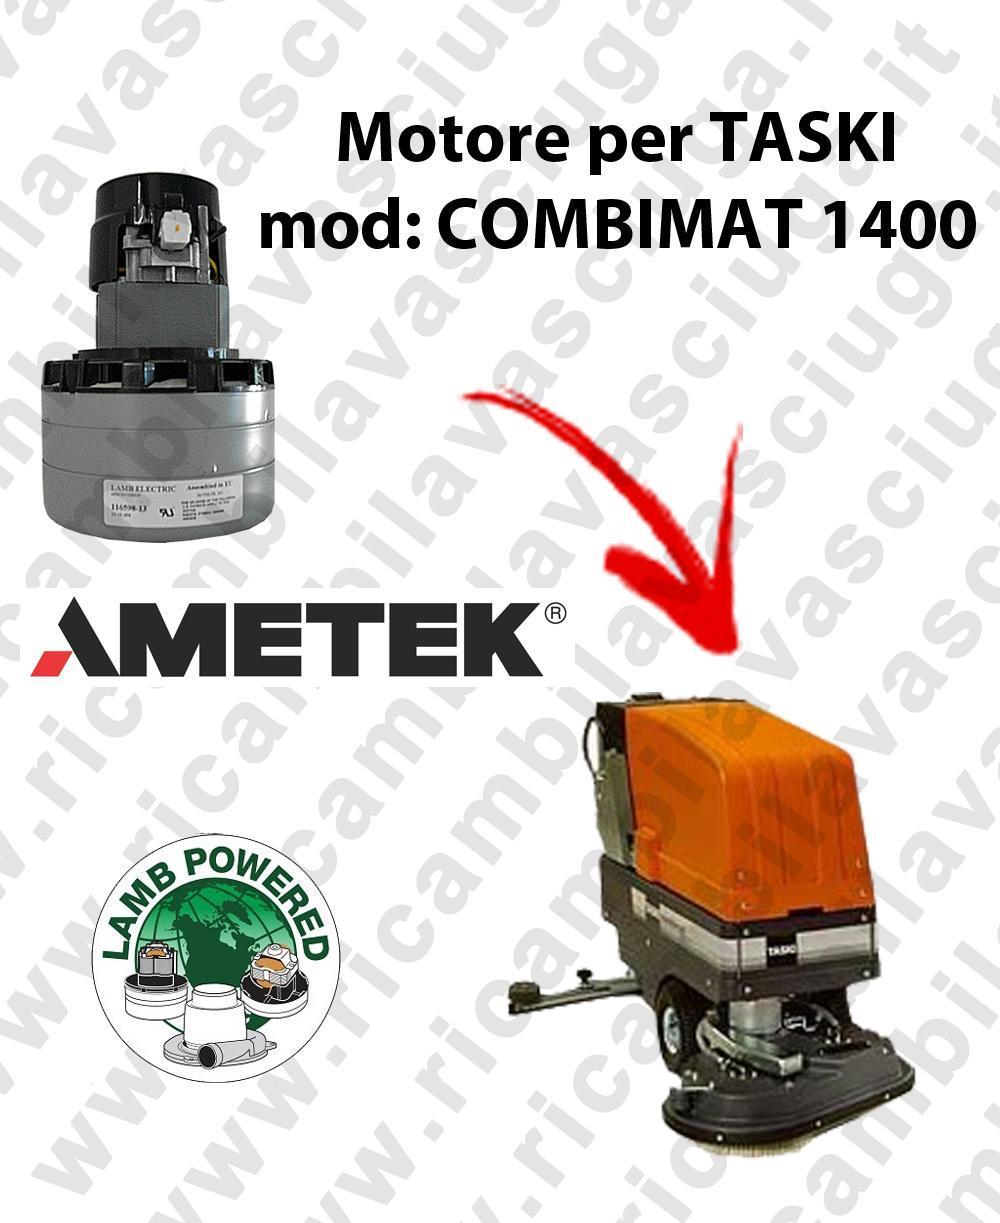 COMBIMAT 1400 Saugmotor LAMB AMETEK für scheuersaugmaschinen TASKI